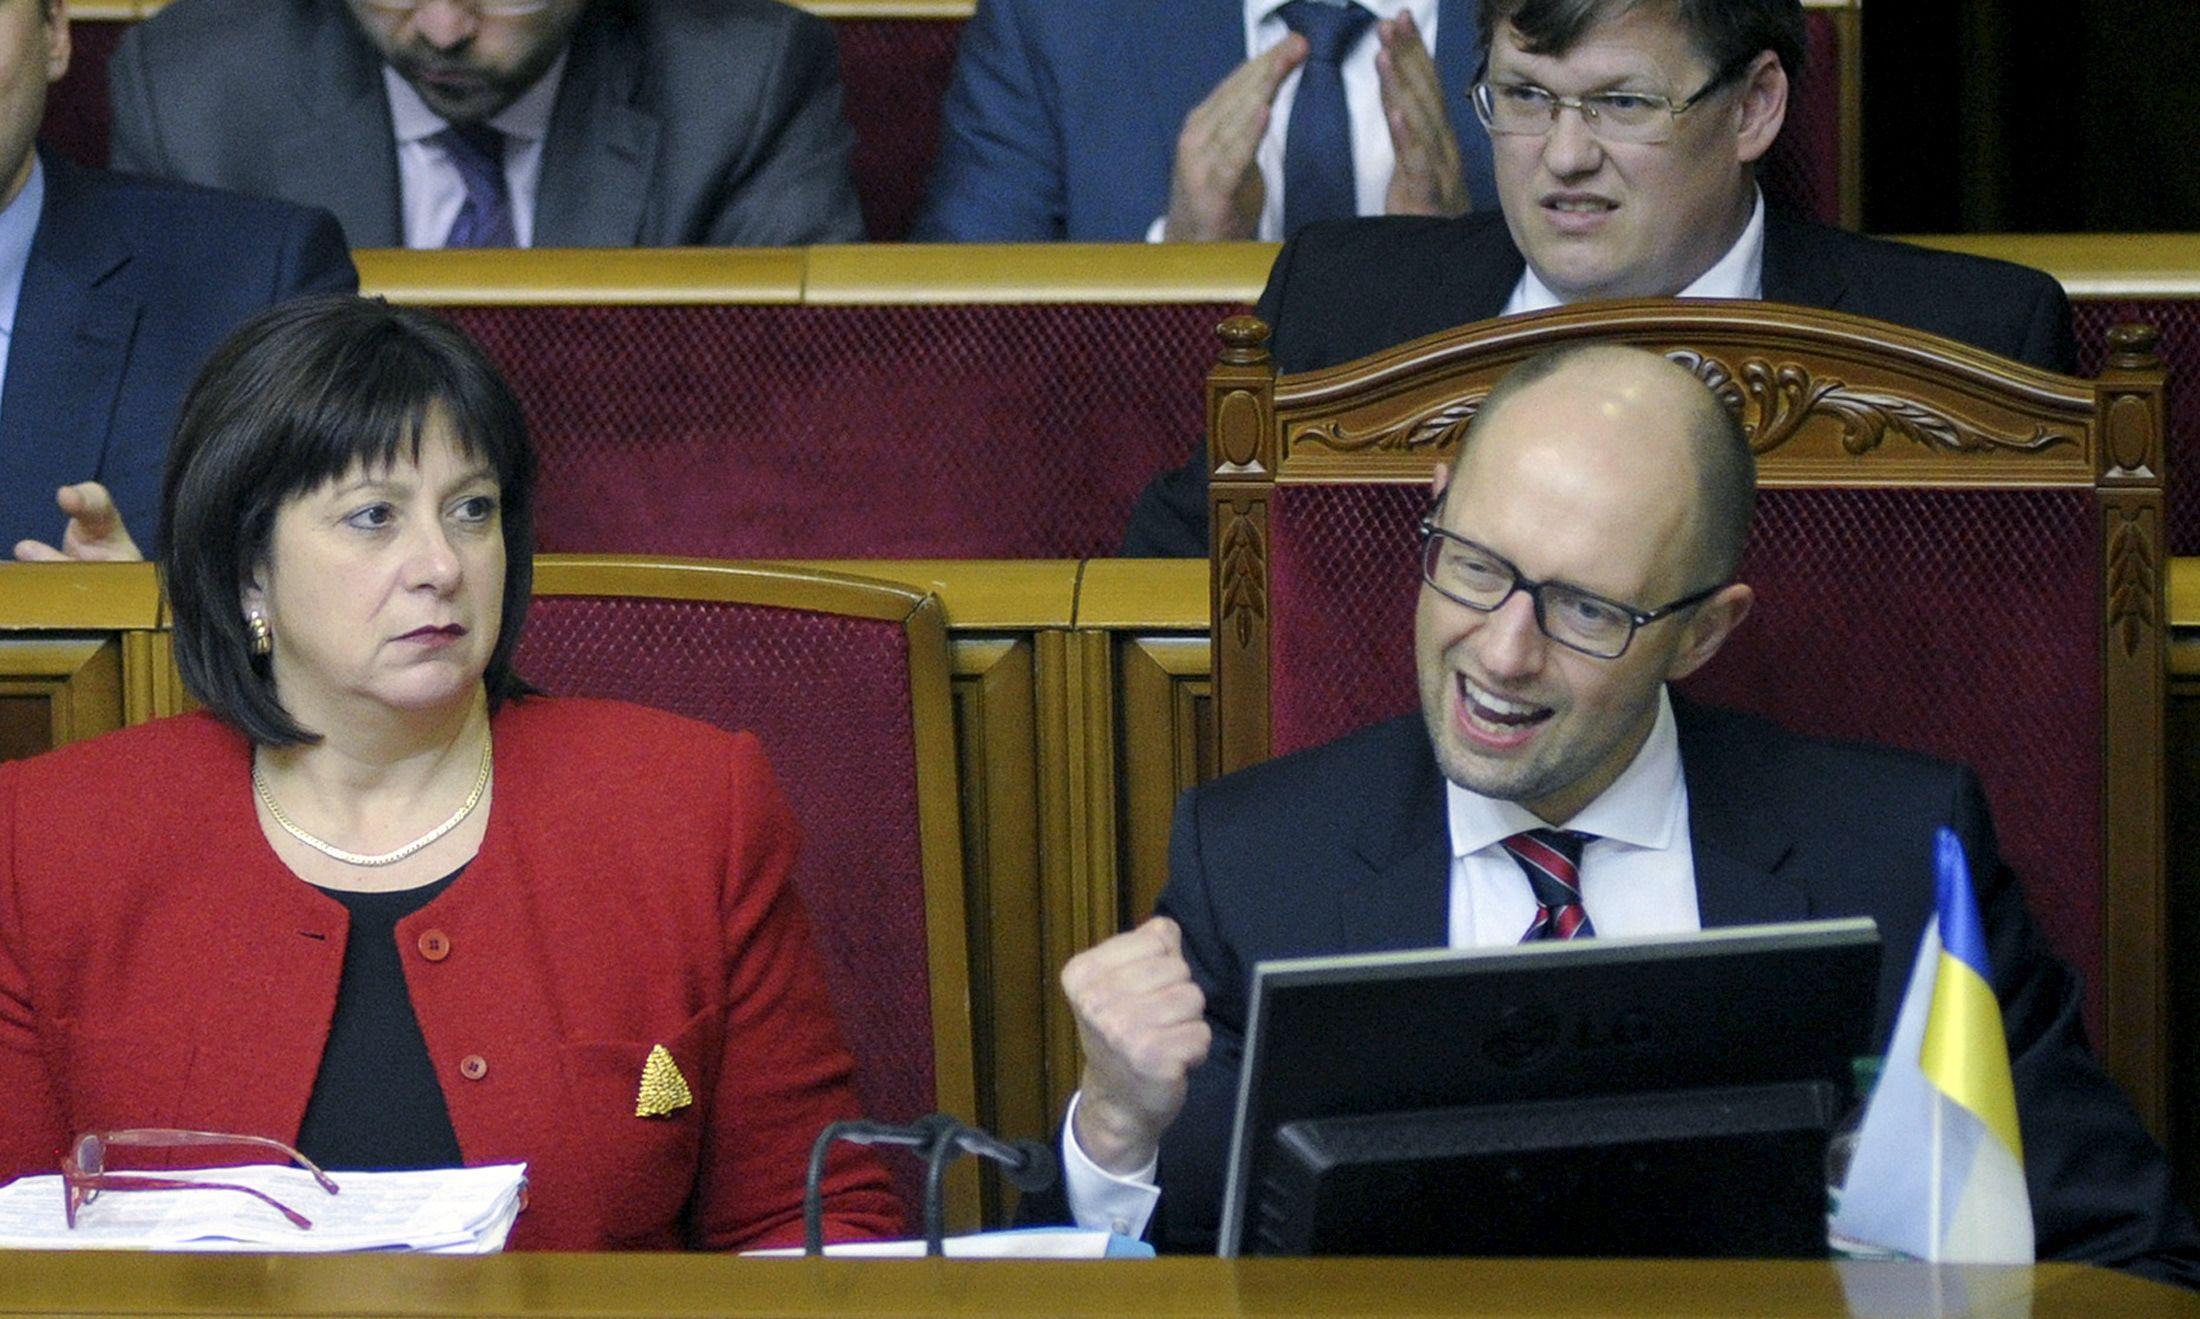 Yatsenyuk punches the air in celebration in parliament